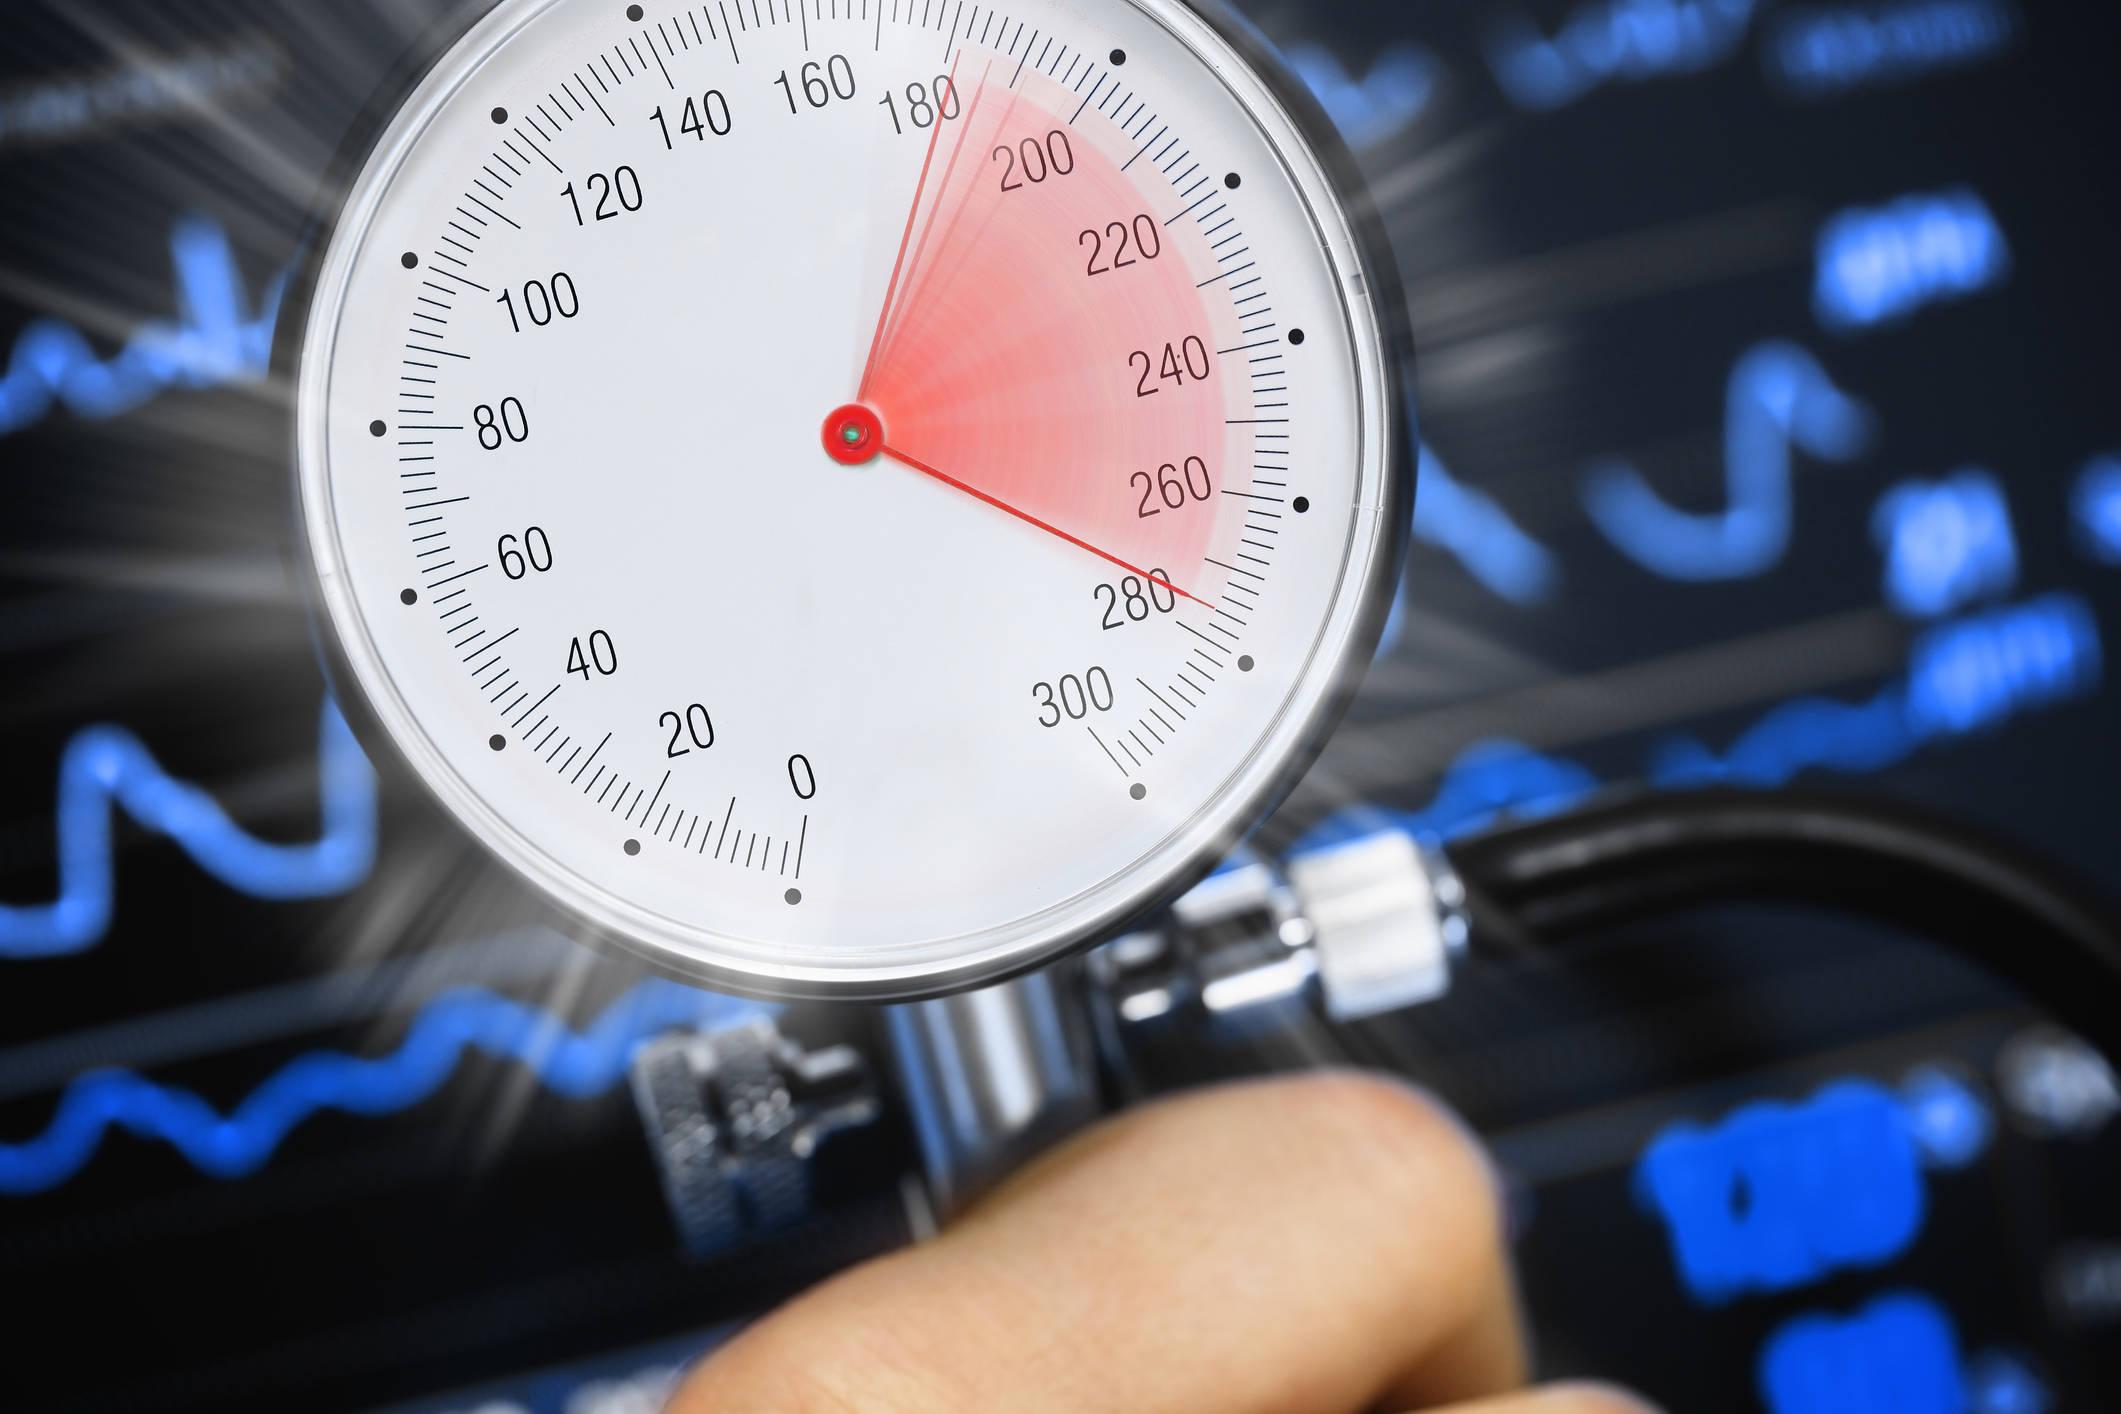 Signo de picos de presión arterial